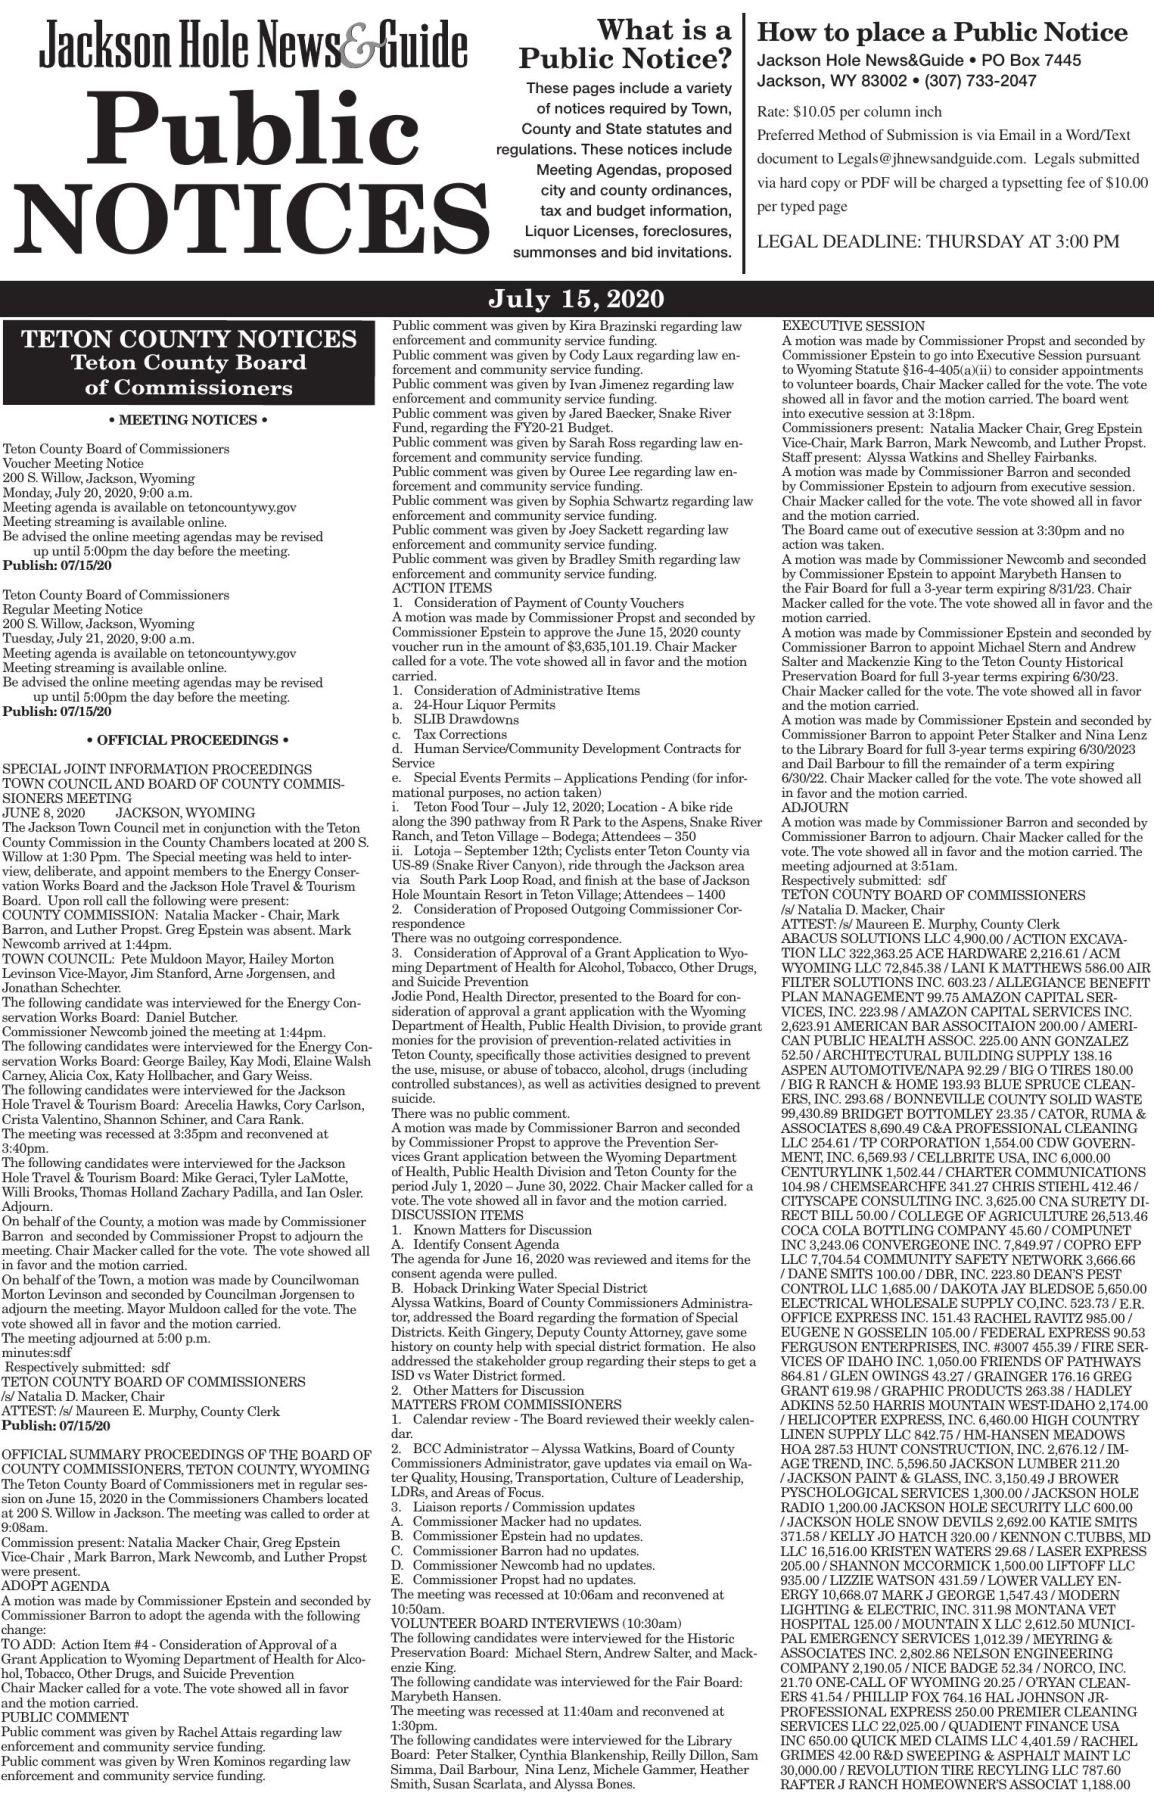 Public Notices, July 15, 2020